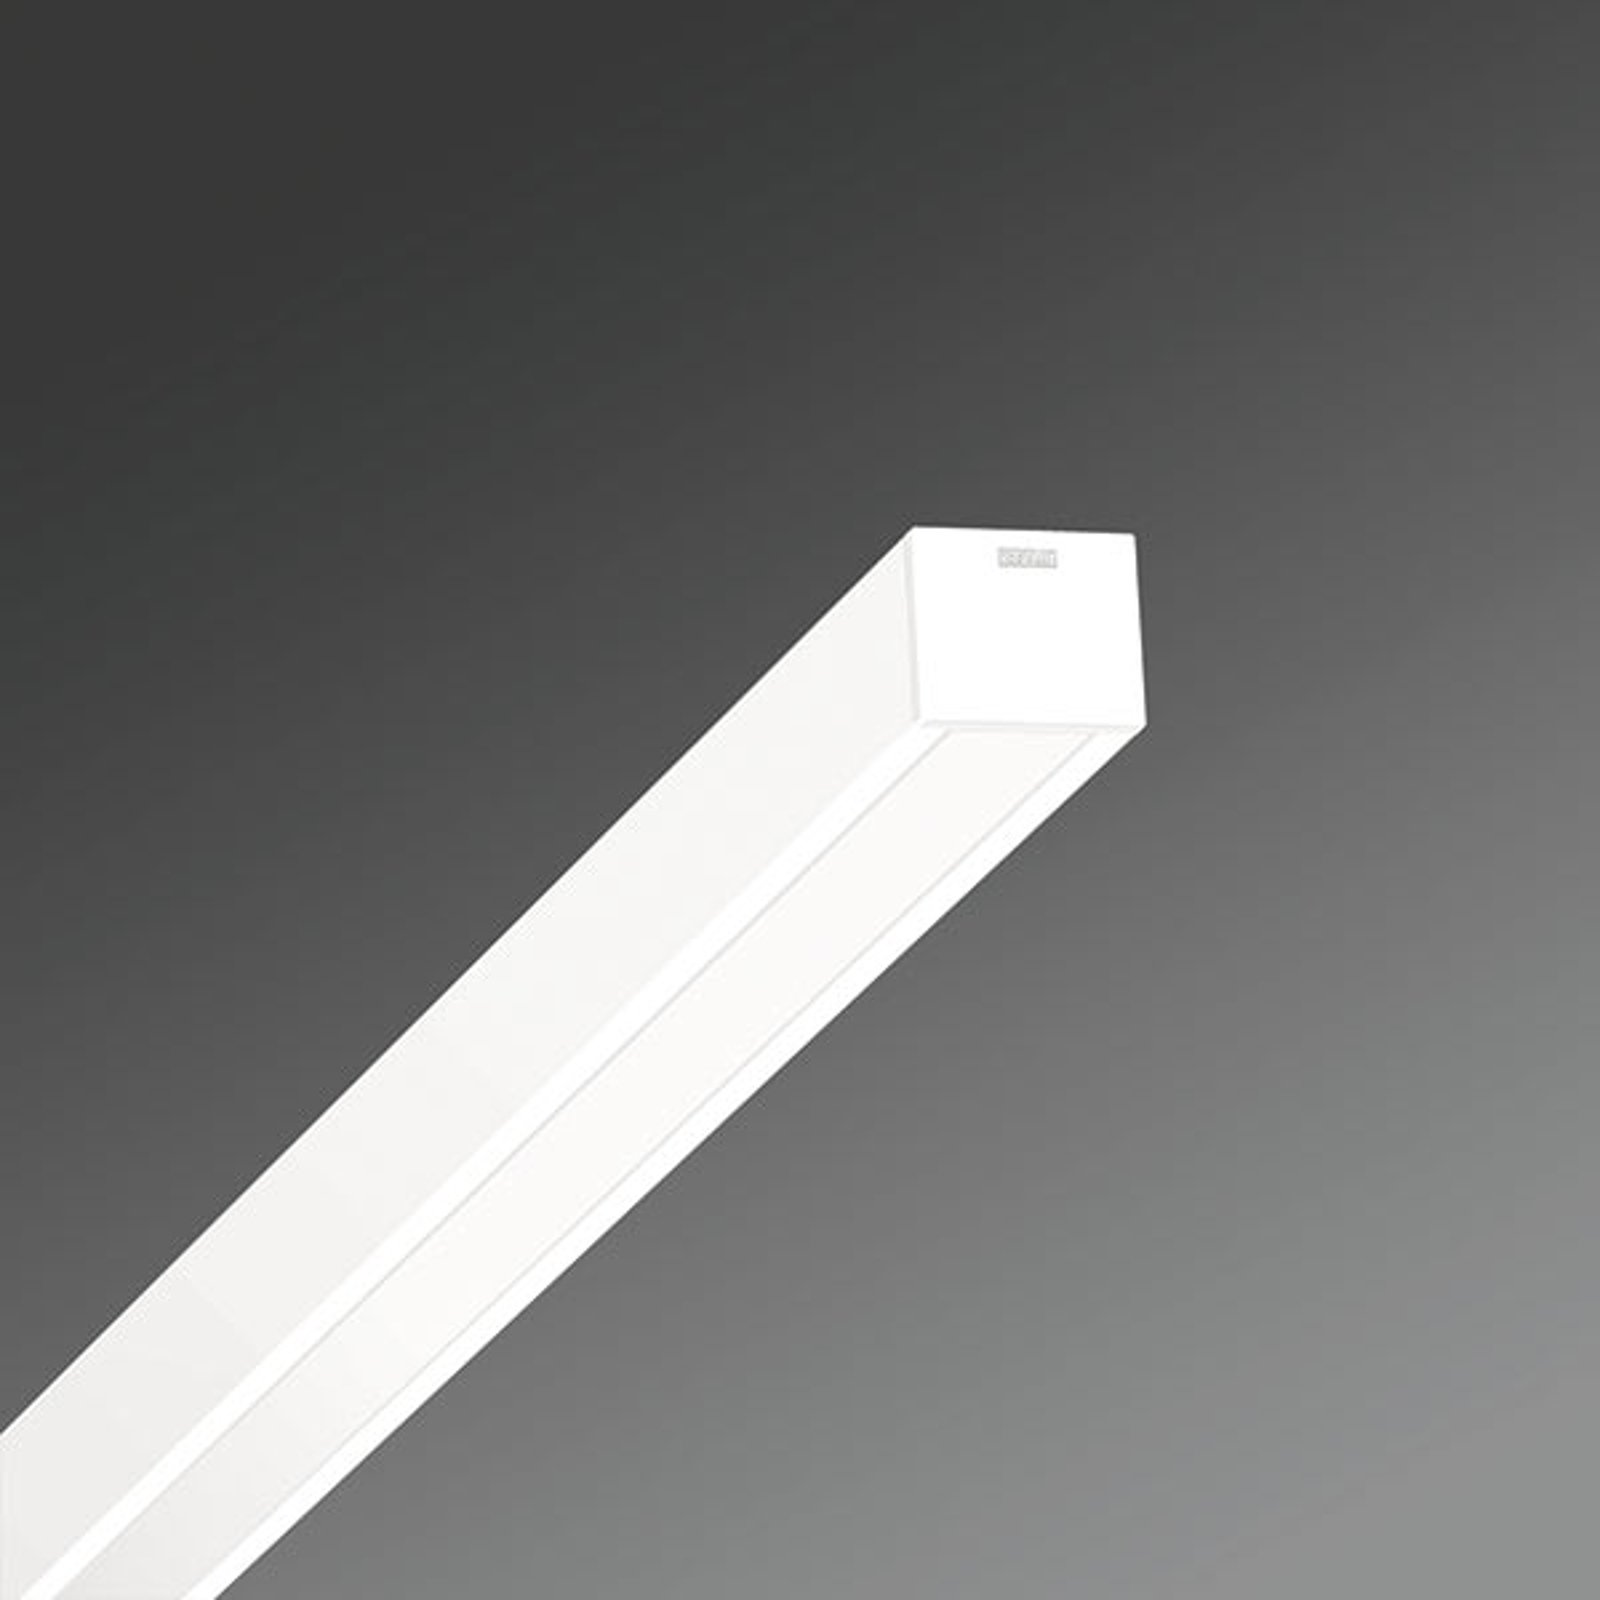 Hokal-HLAG/1500 LED lyskanal-taklampe 36 W